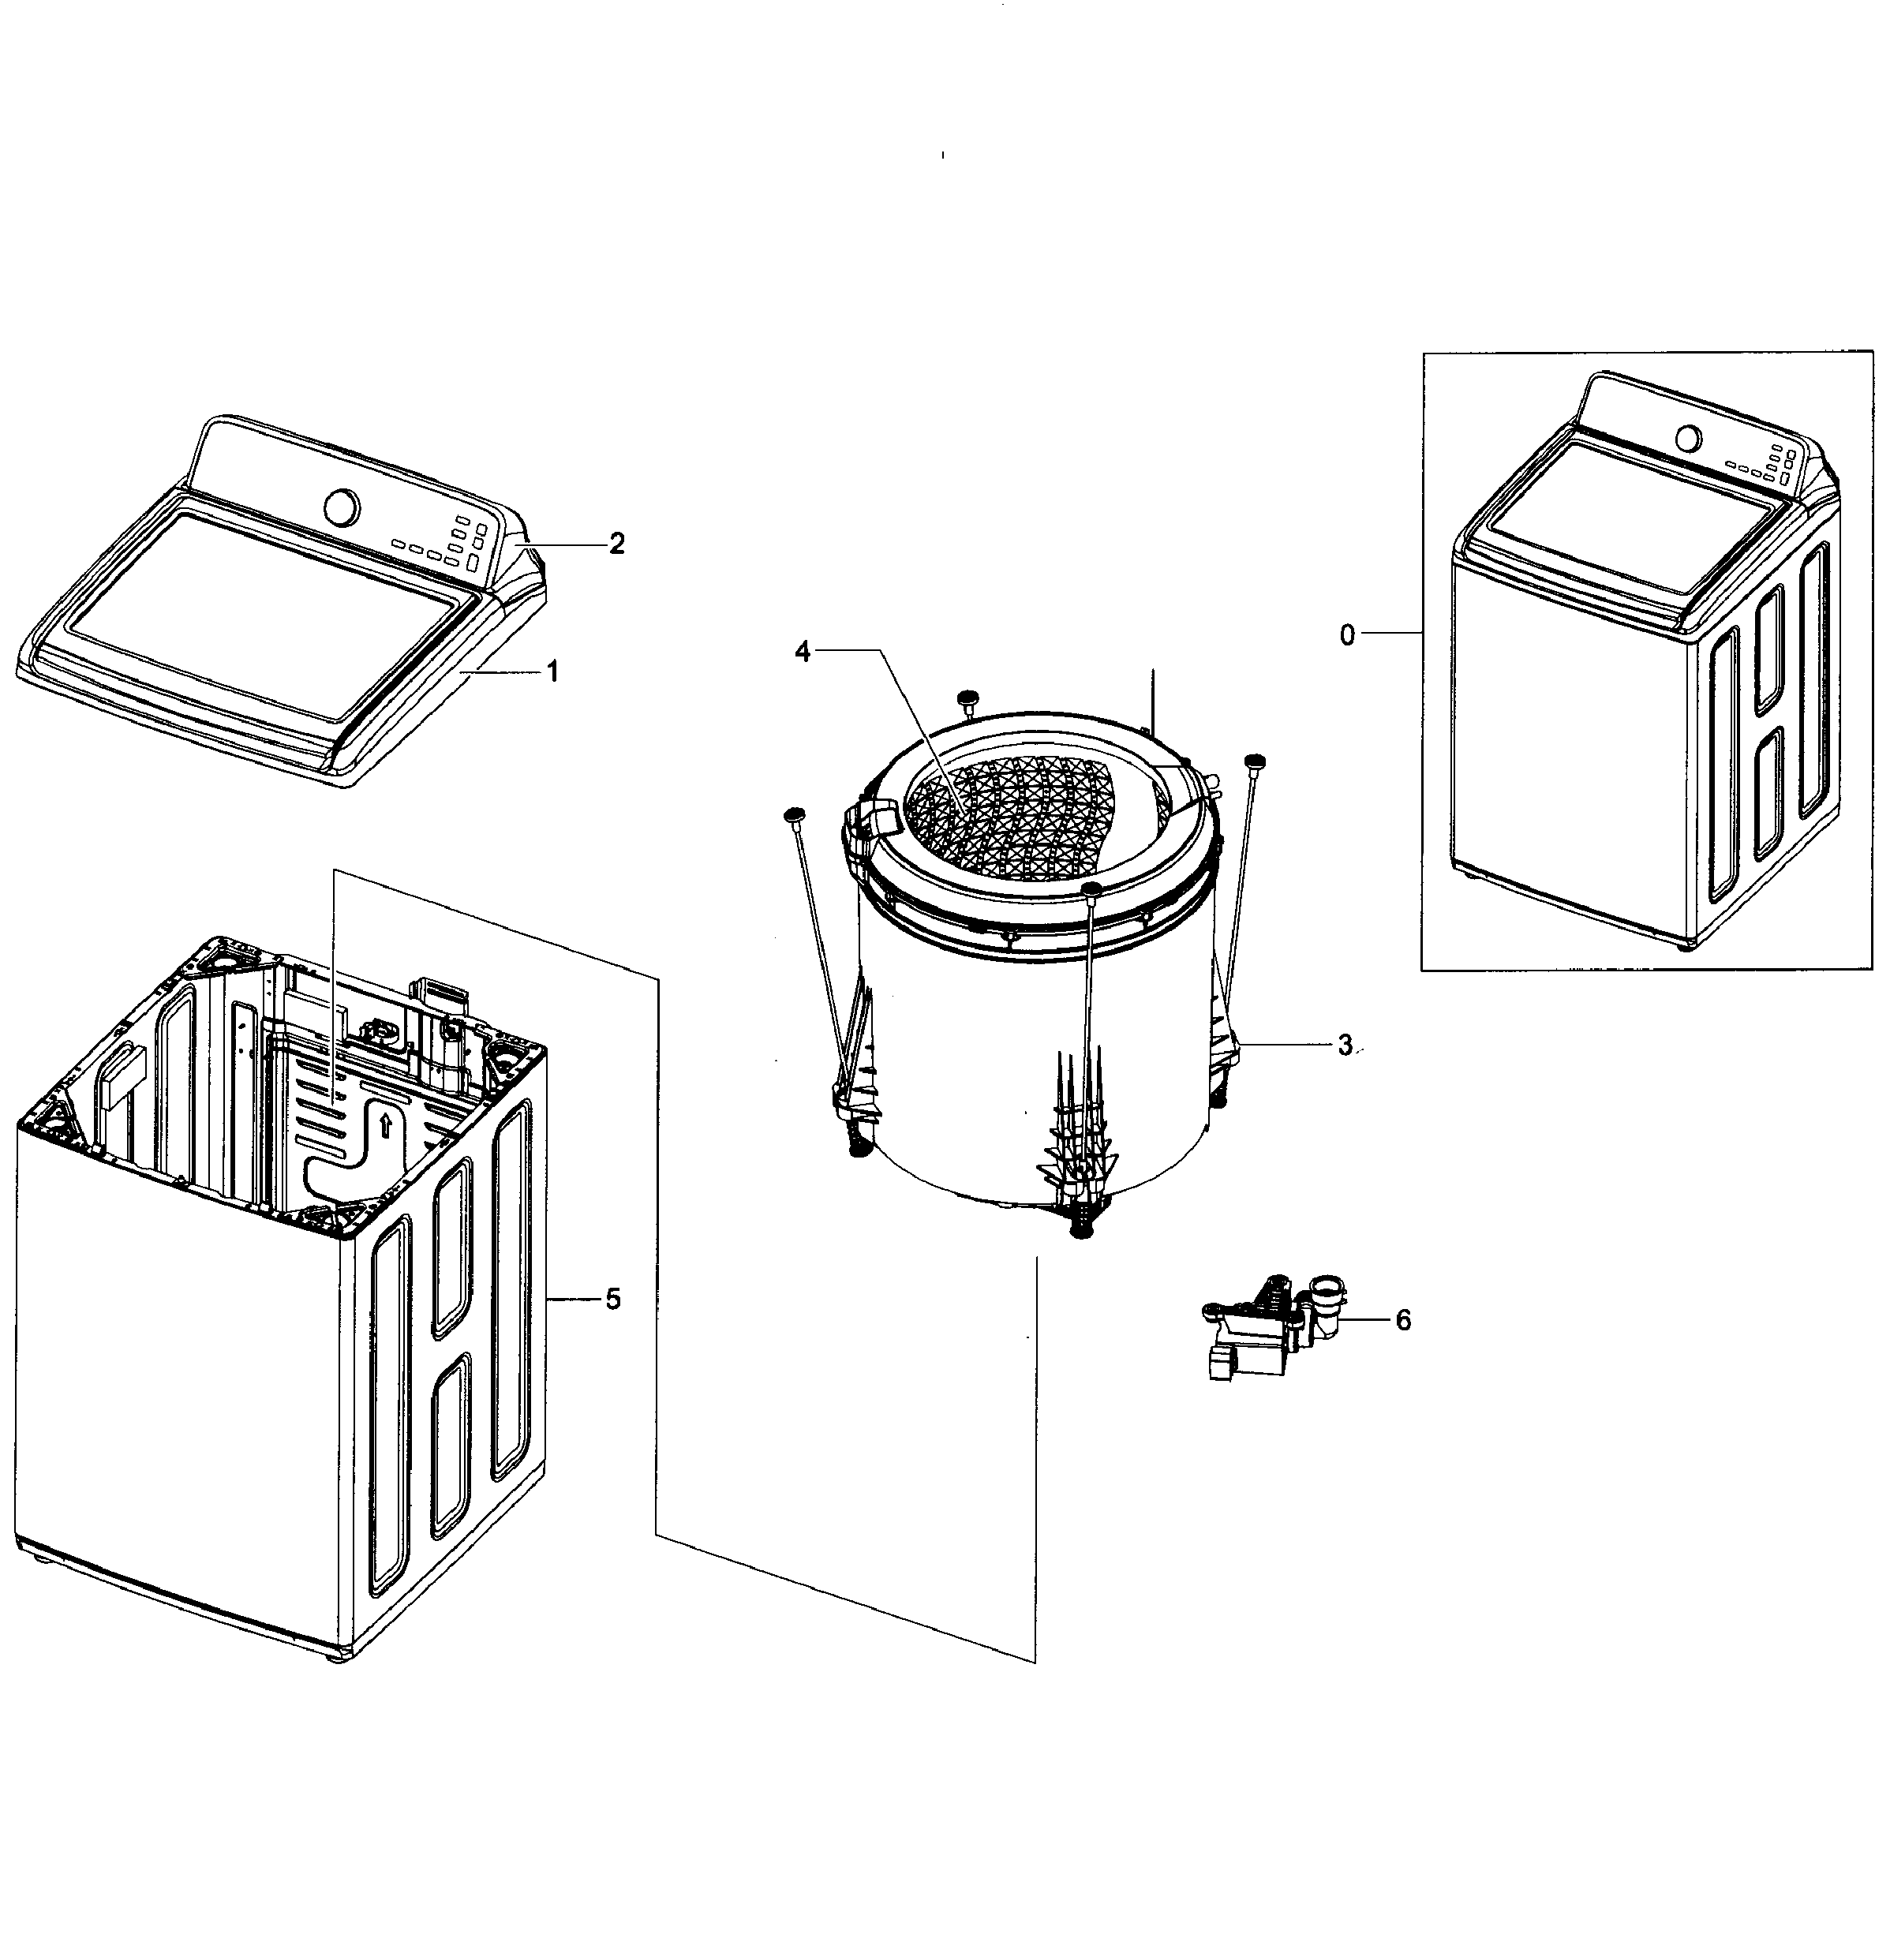 Dh 6562 Samsung Washing Machine Wiring Kit Free Download Wiring Diagrams Schematic Wiring